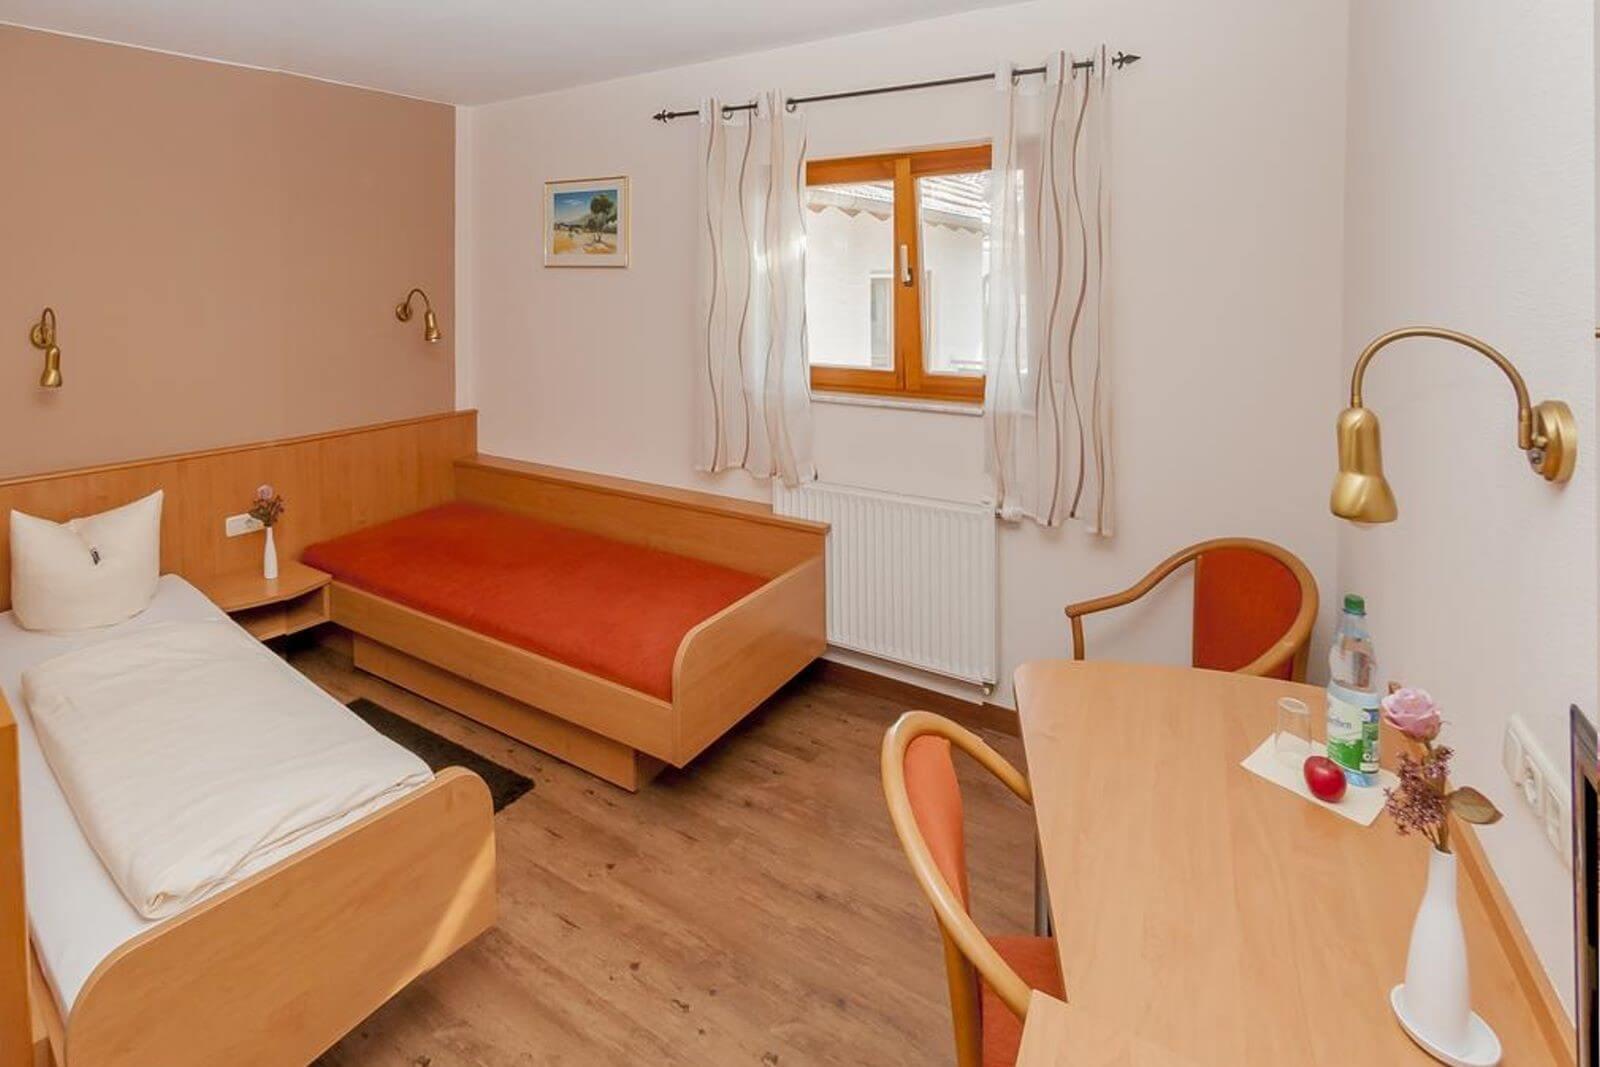 doppelzimmer-standard-hotel-pension-bett-fruehstueck-riedstadt